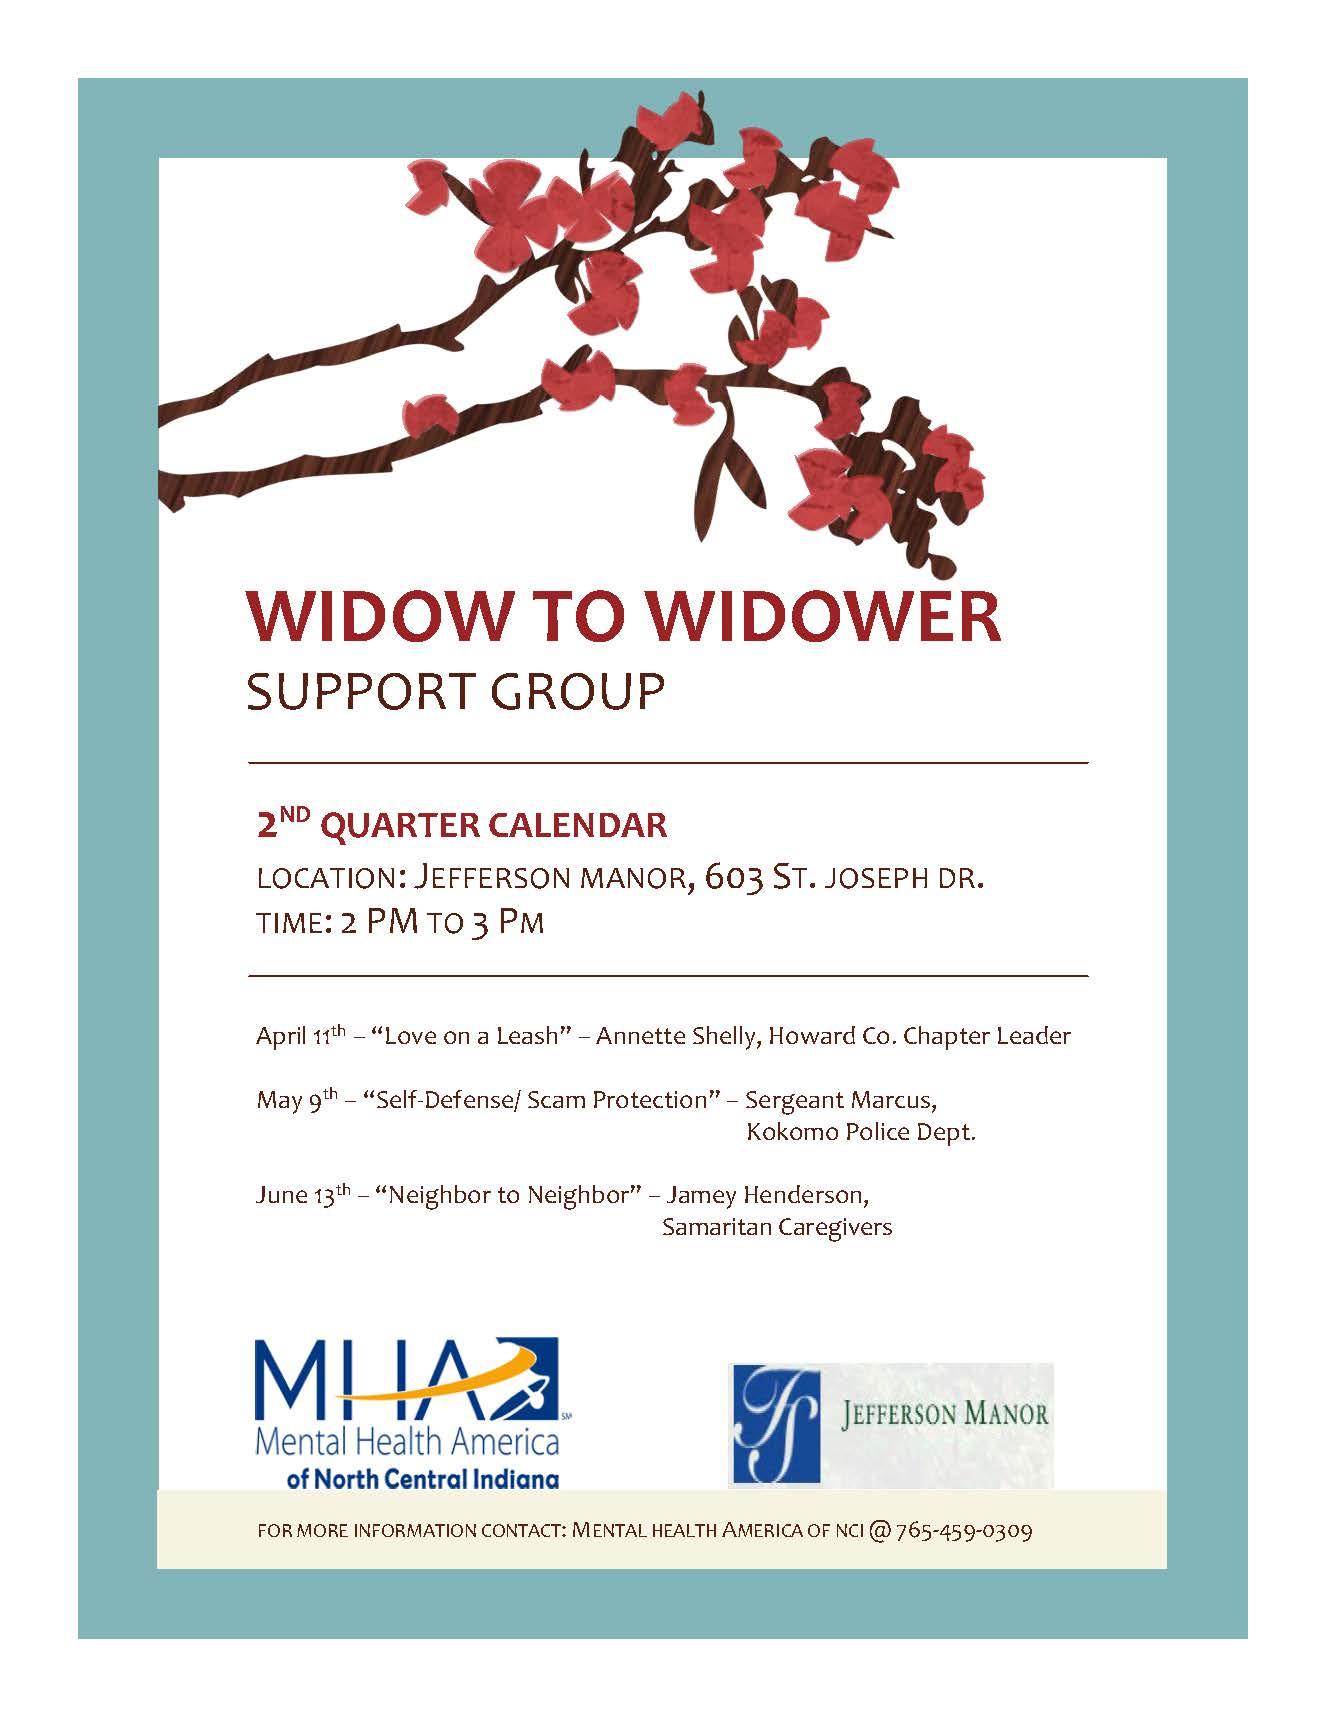 Widow to Widower Support Group